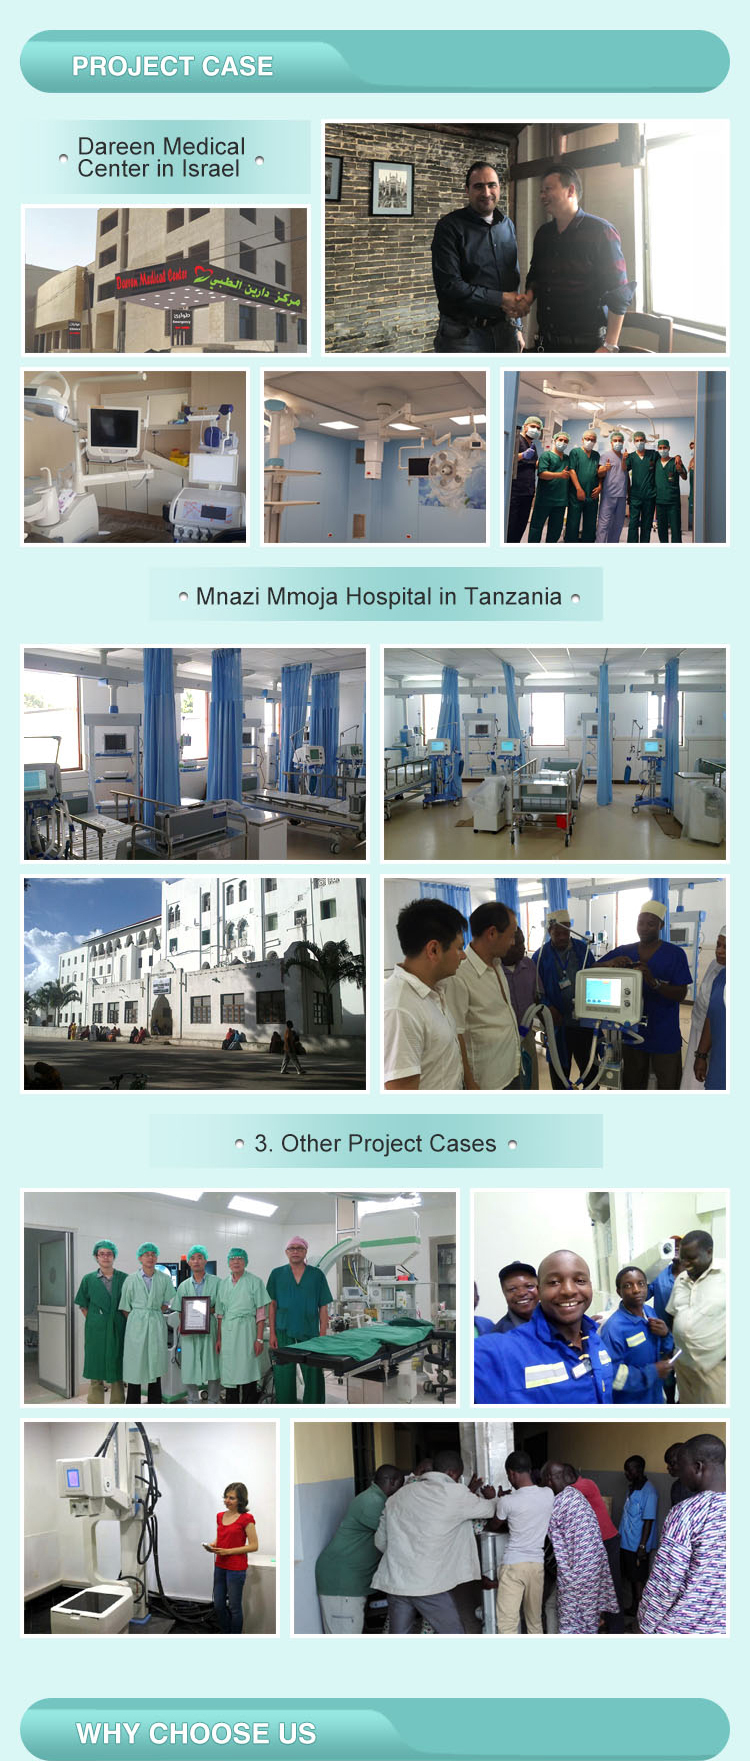 ZT-AL-03 Best Quality Optical Equipment Auto Lensmeter Lensometer Focimeter Manufacturer